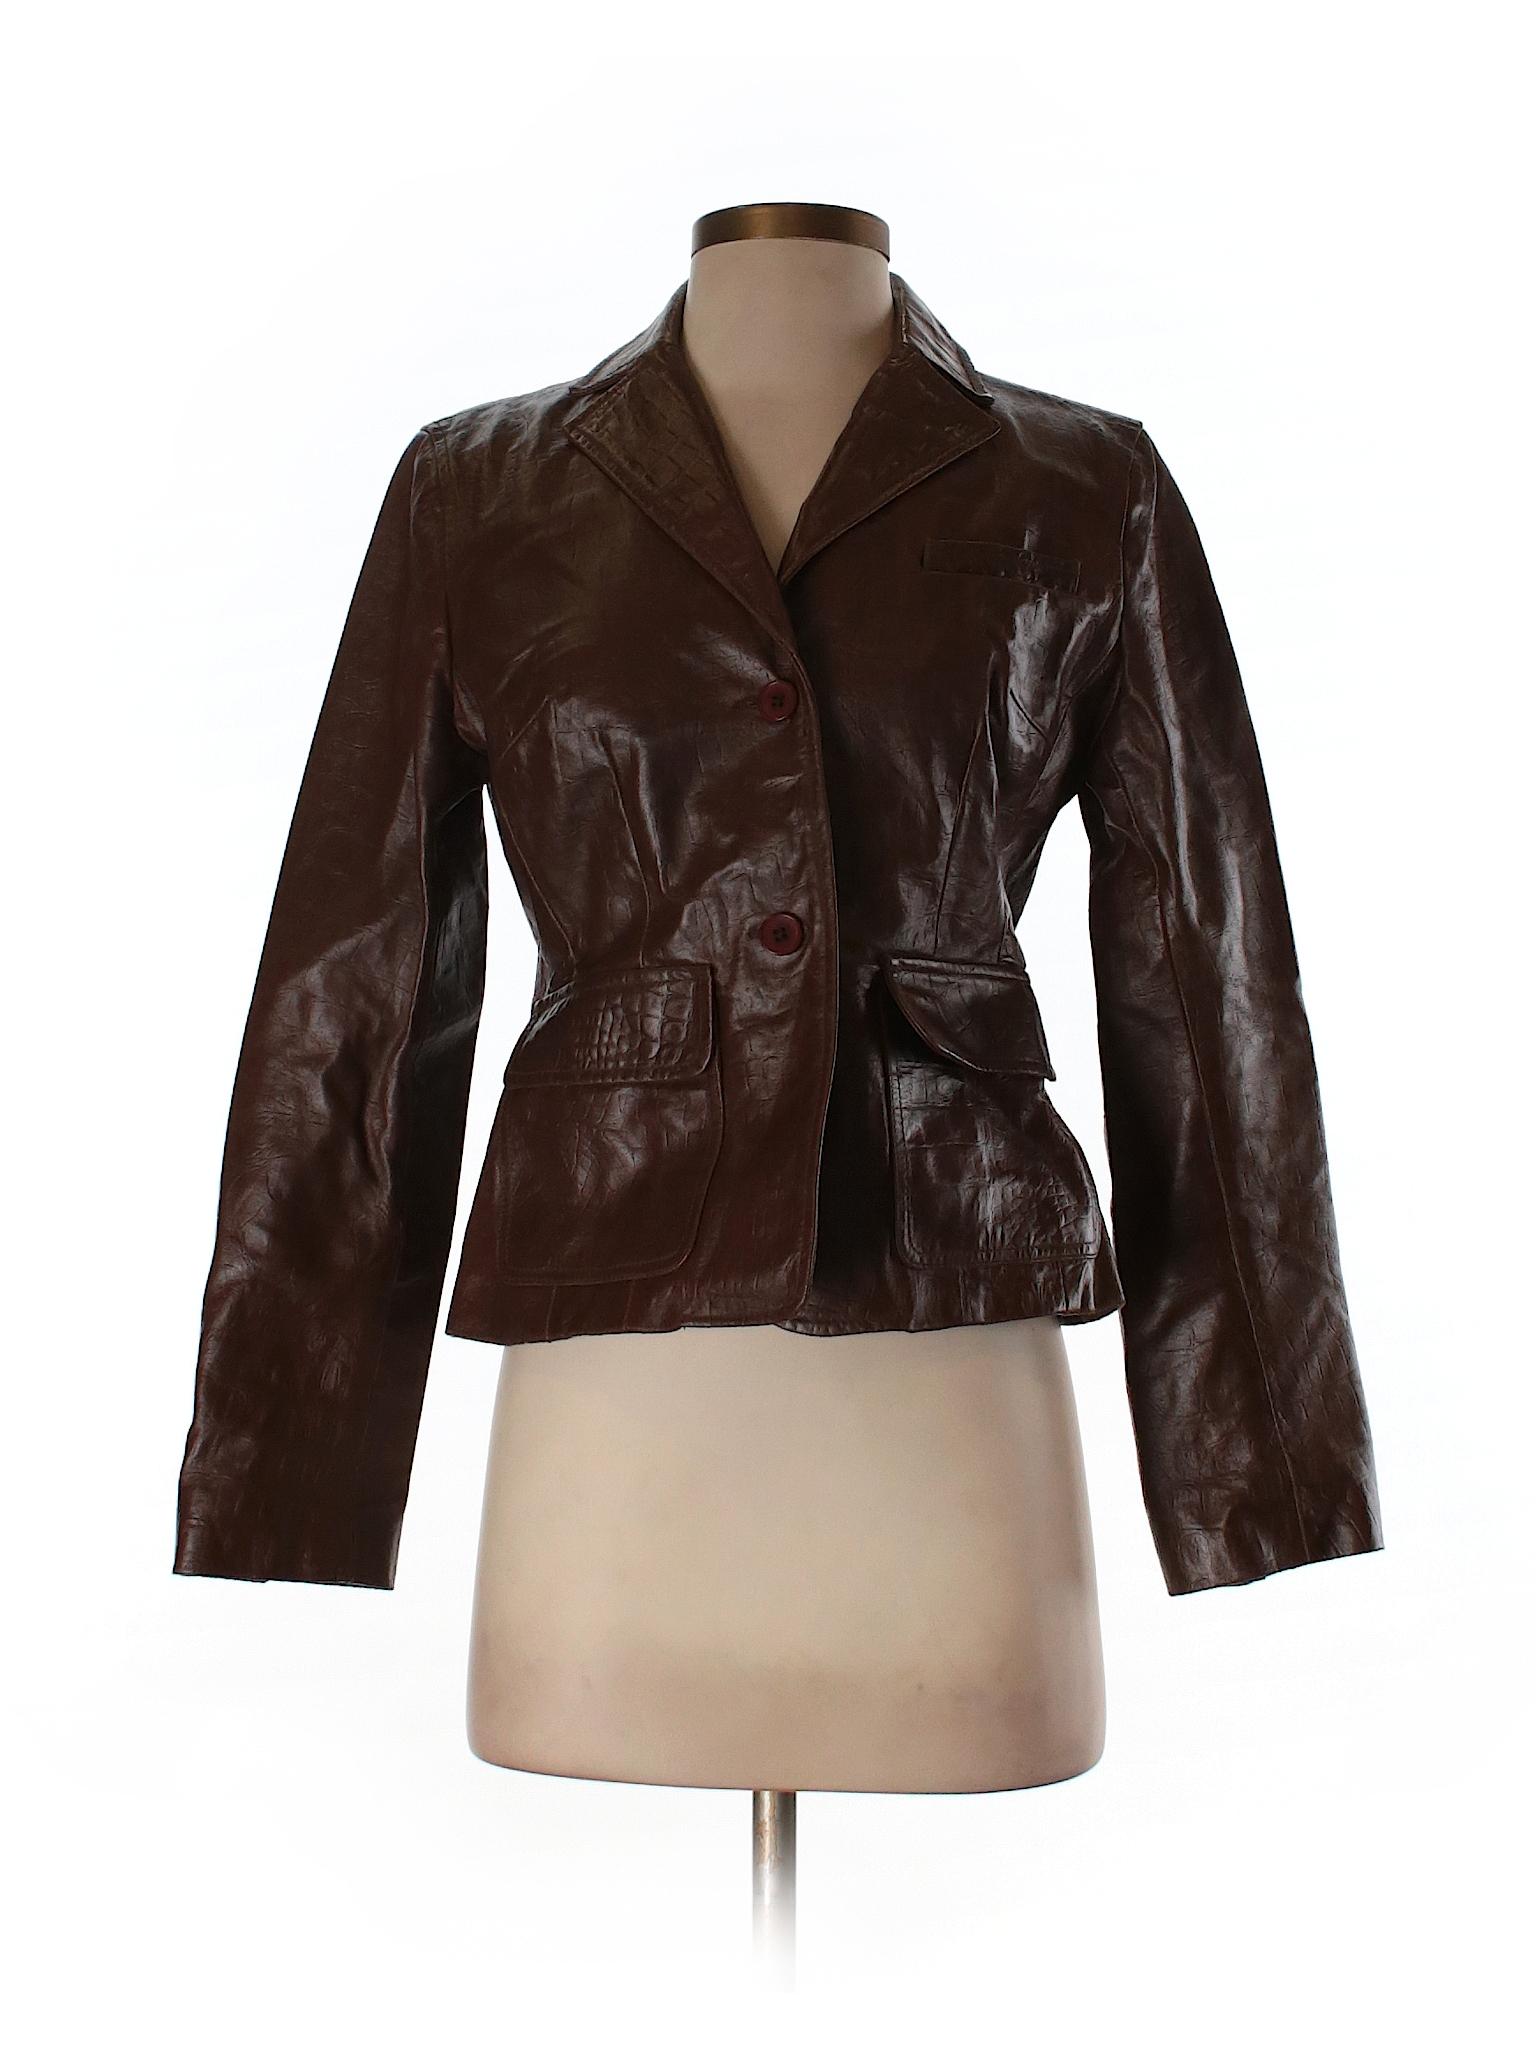 Ann taylor loft leather jacket